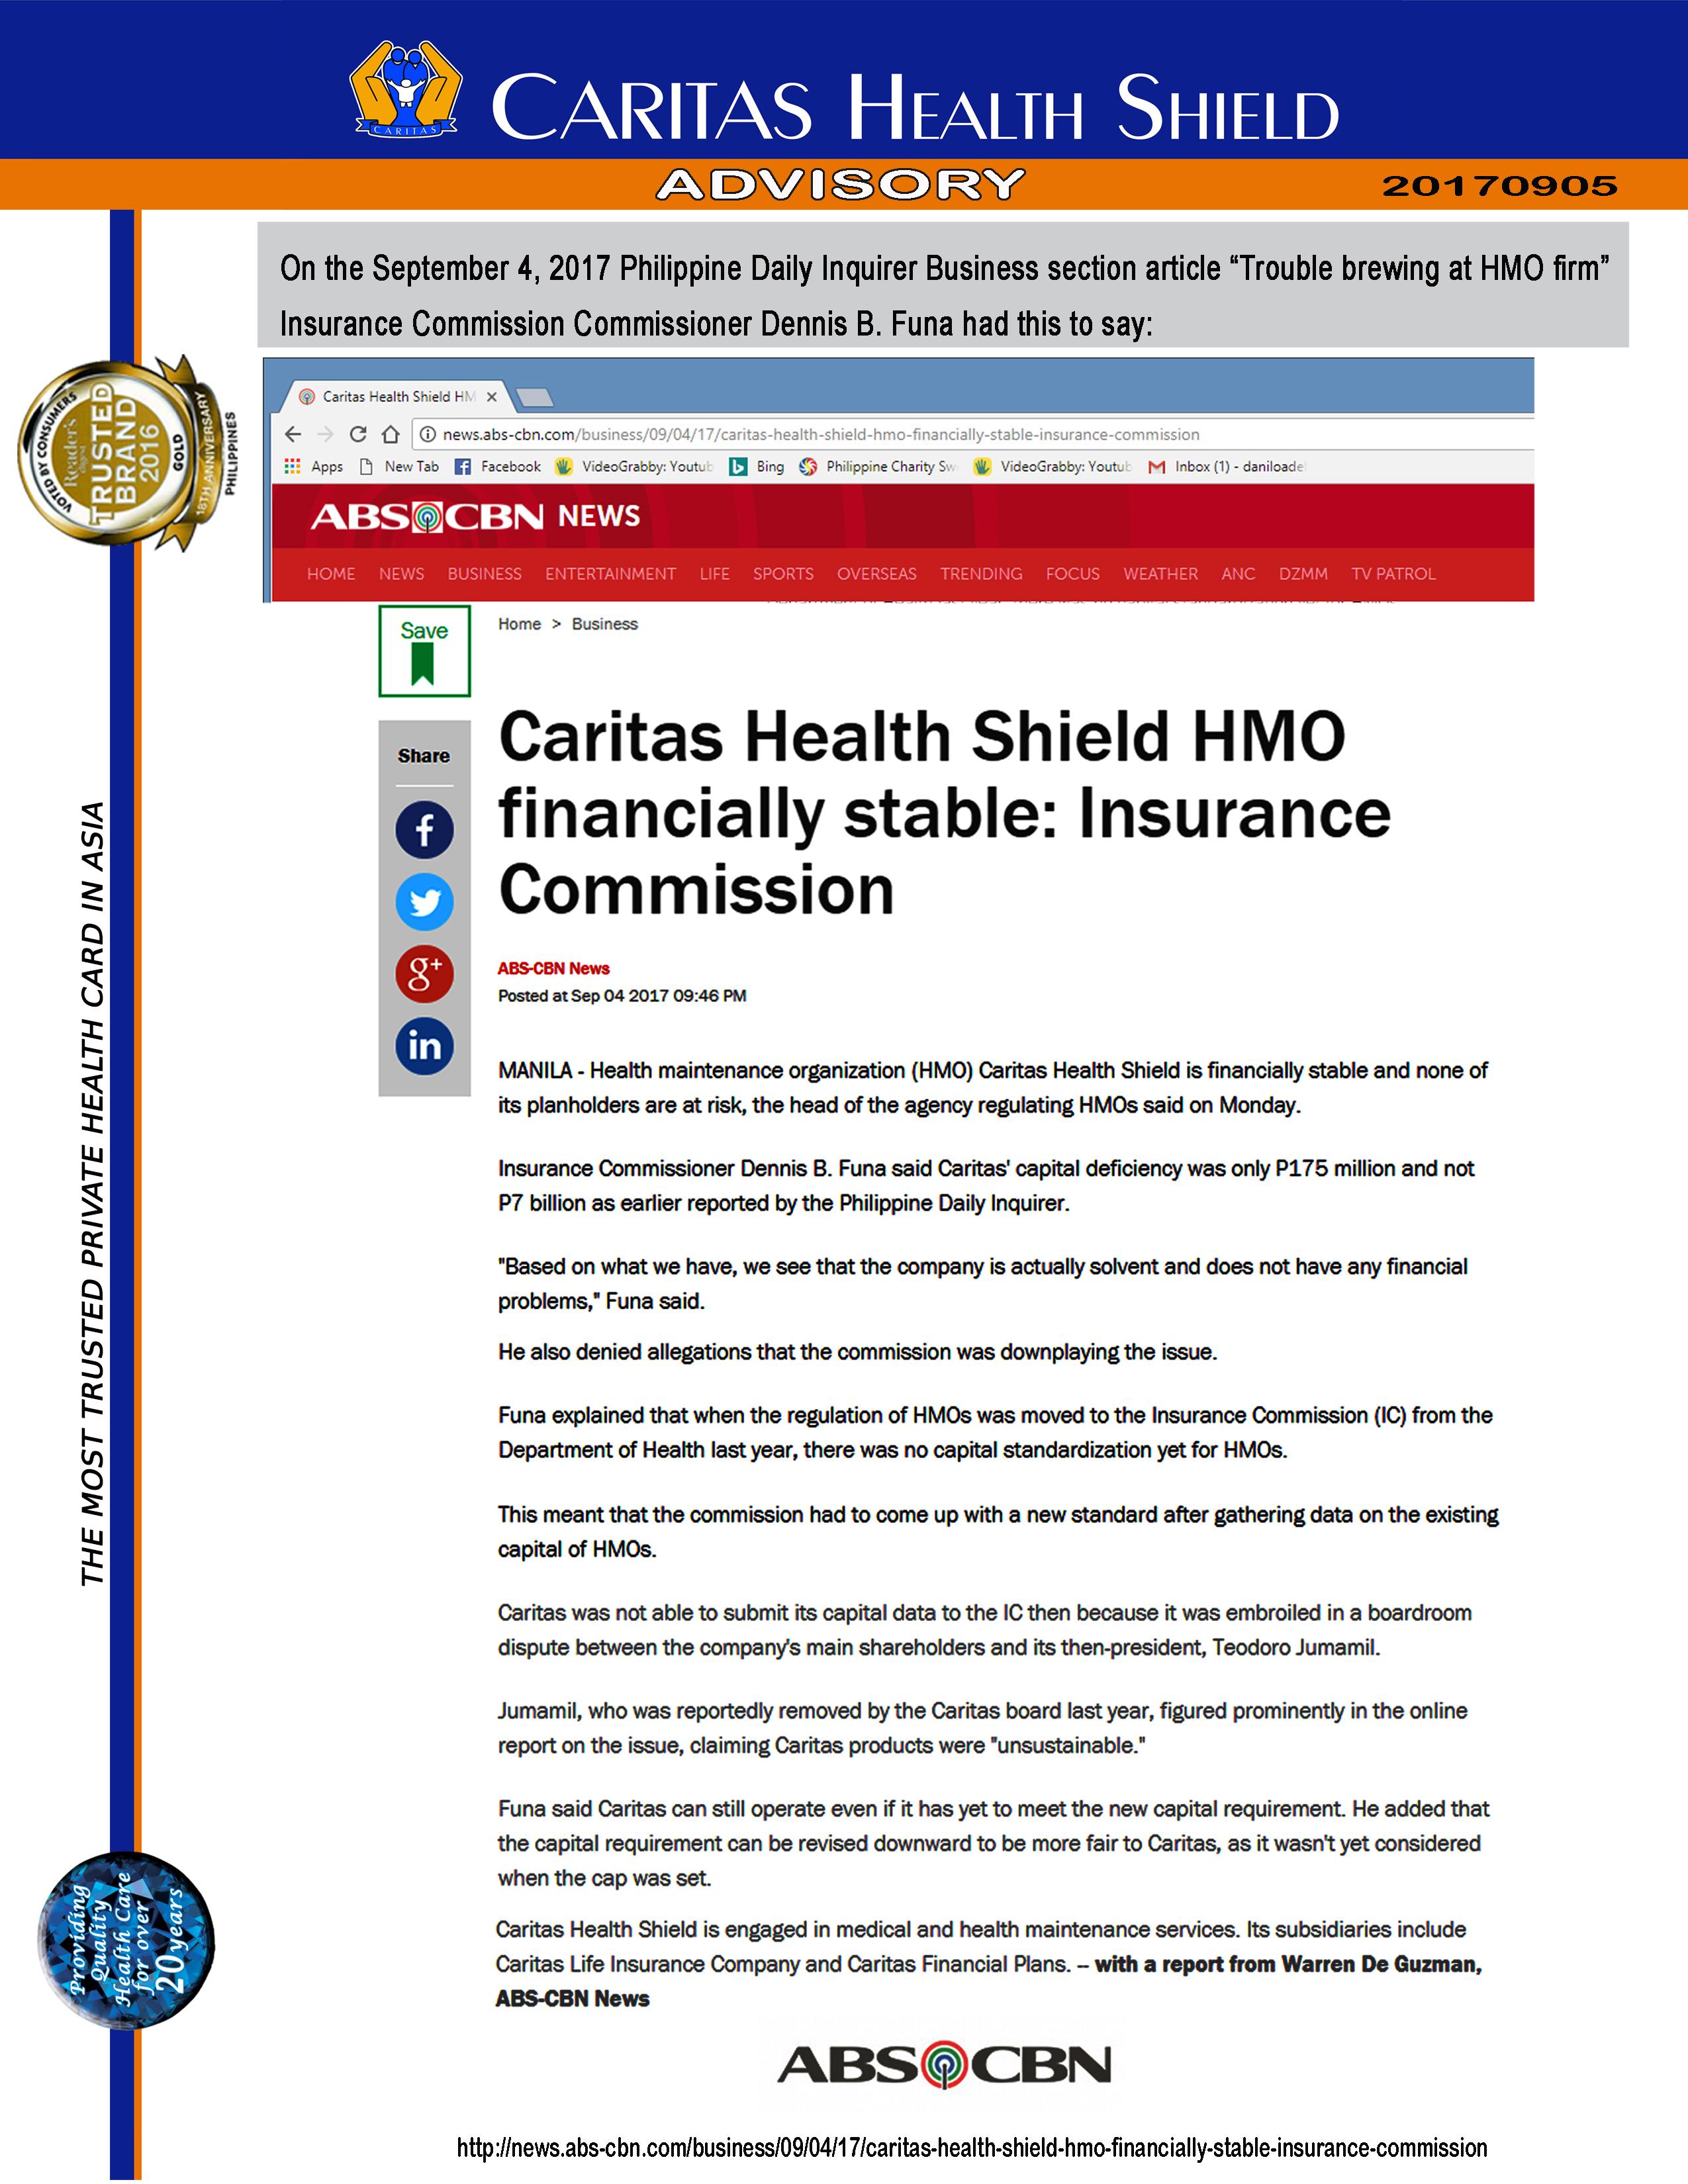 Caritas Health Shield